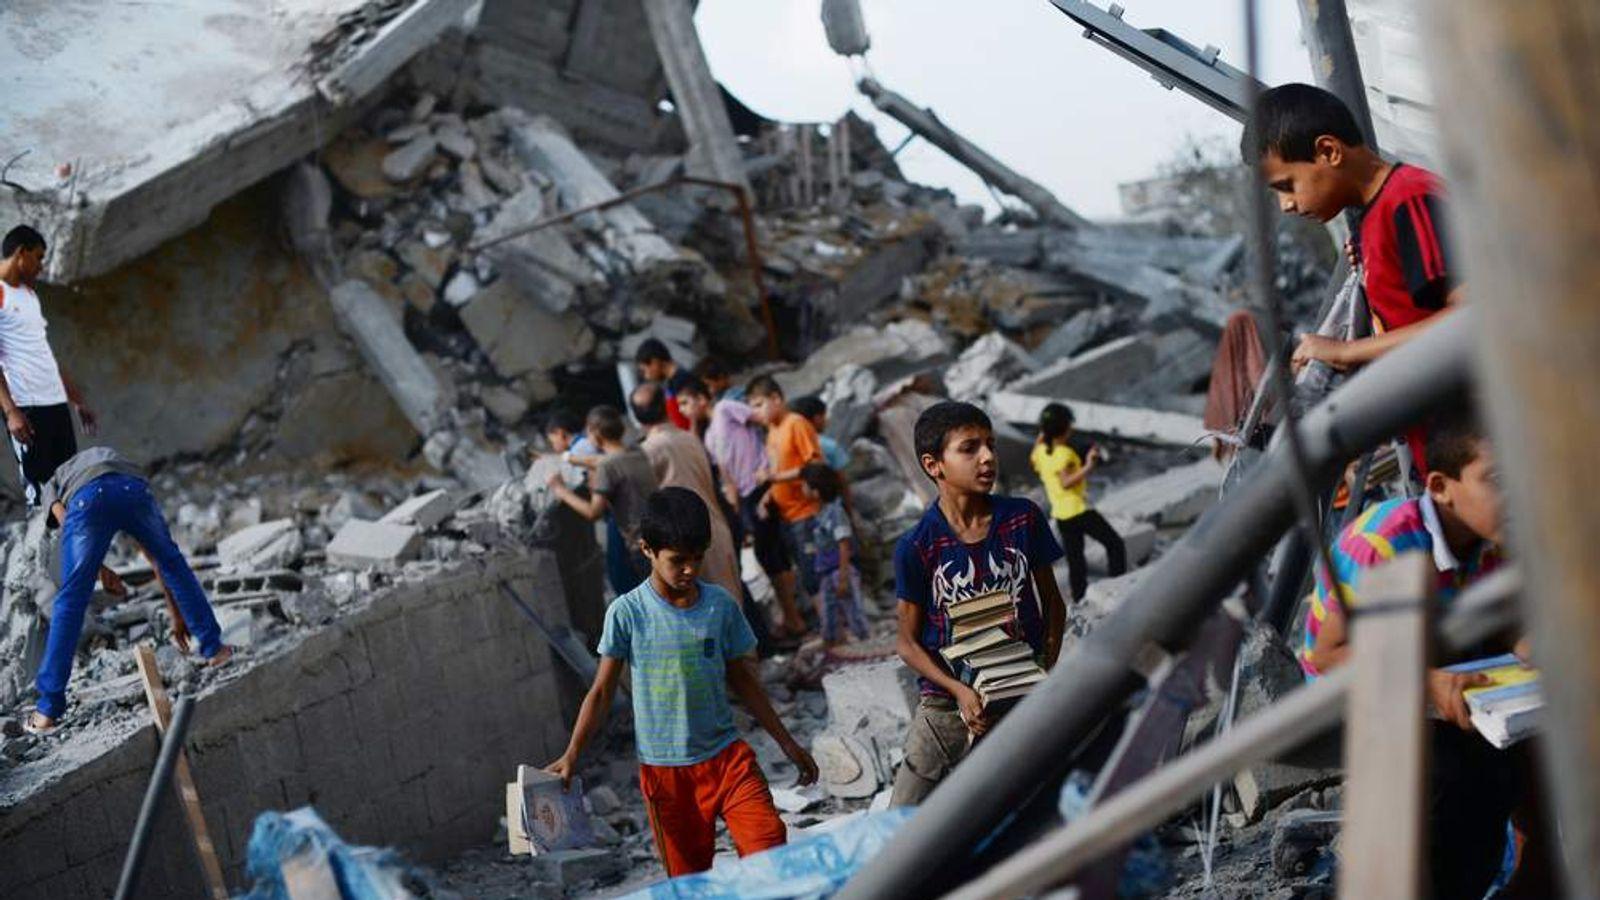 PALESTINIAN-GAZA-ISRAEL-CONFLICT